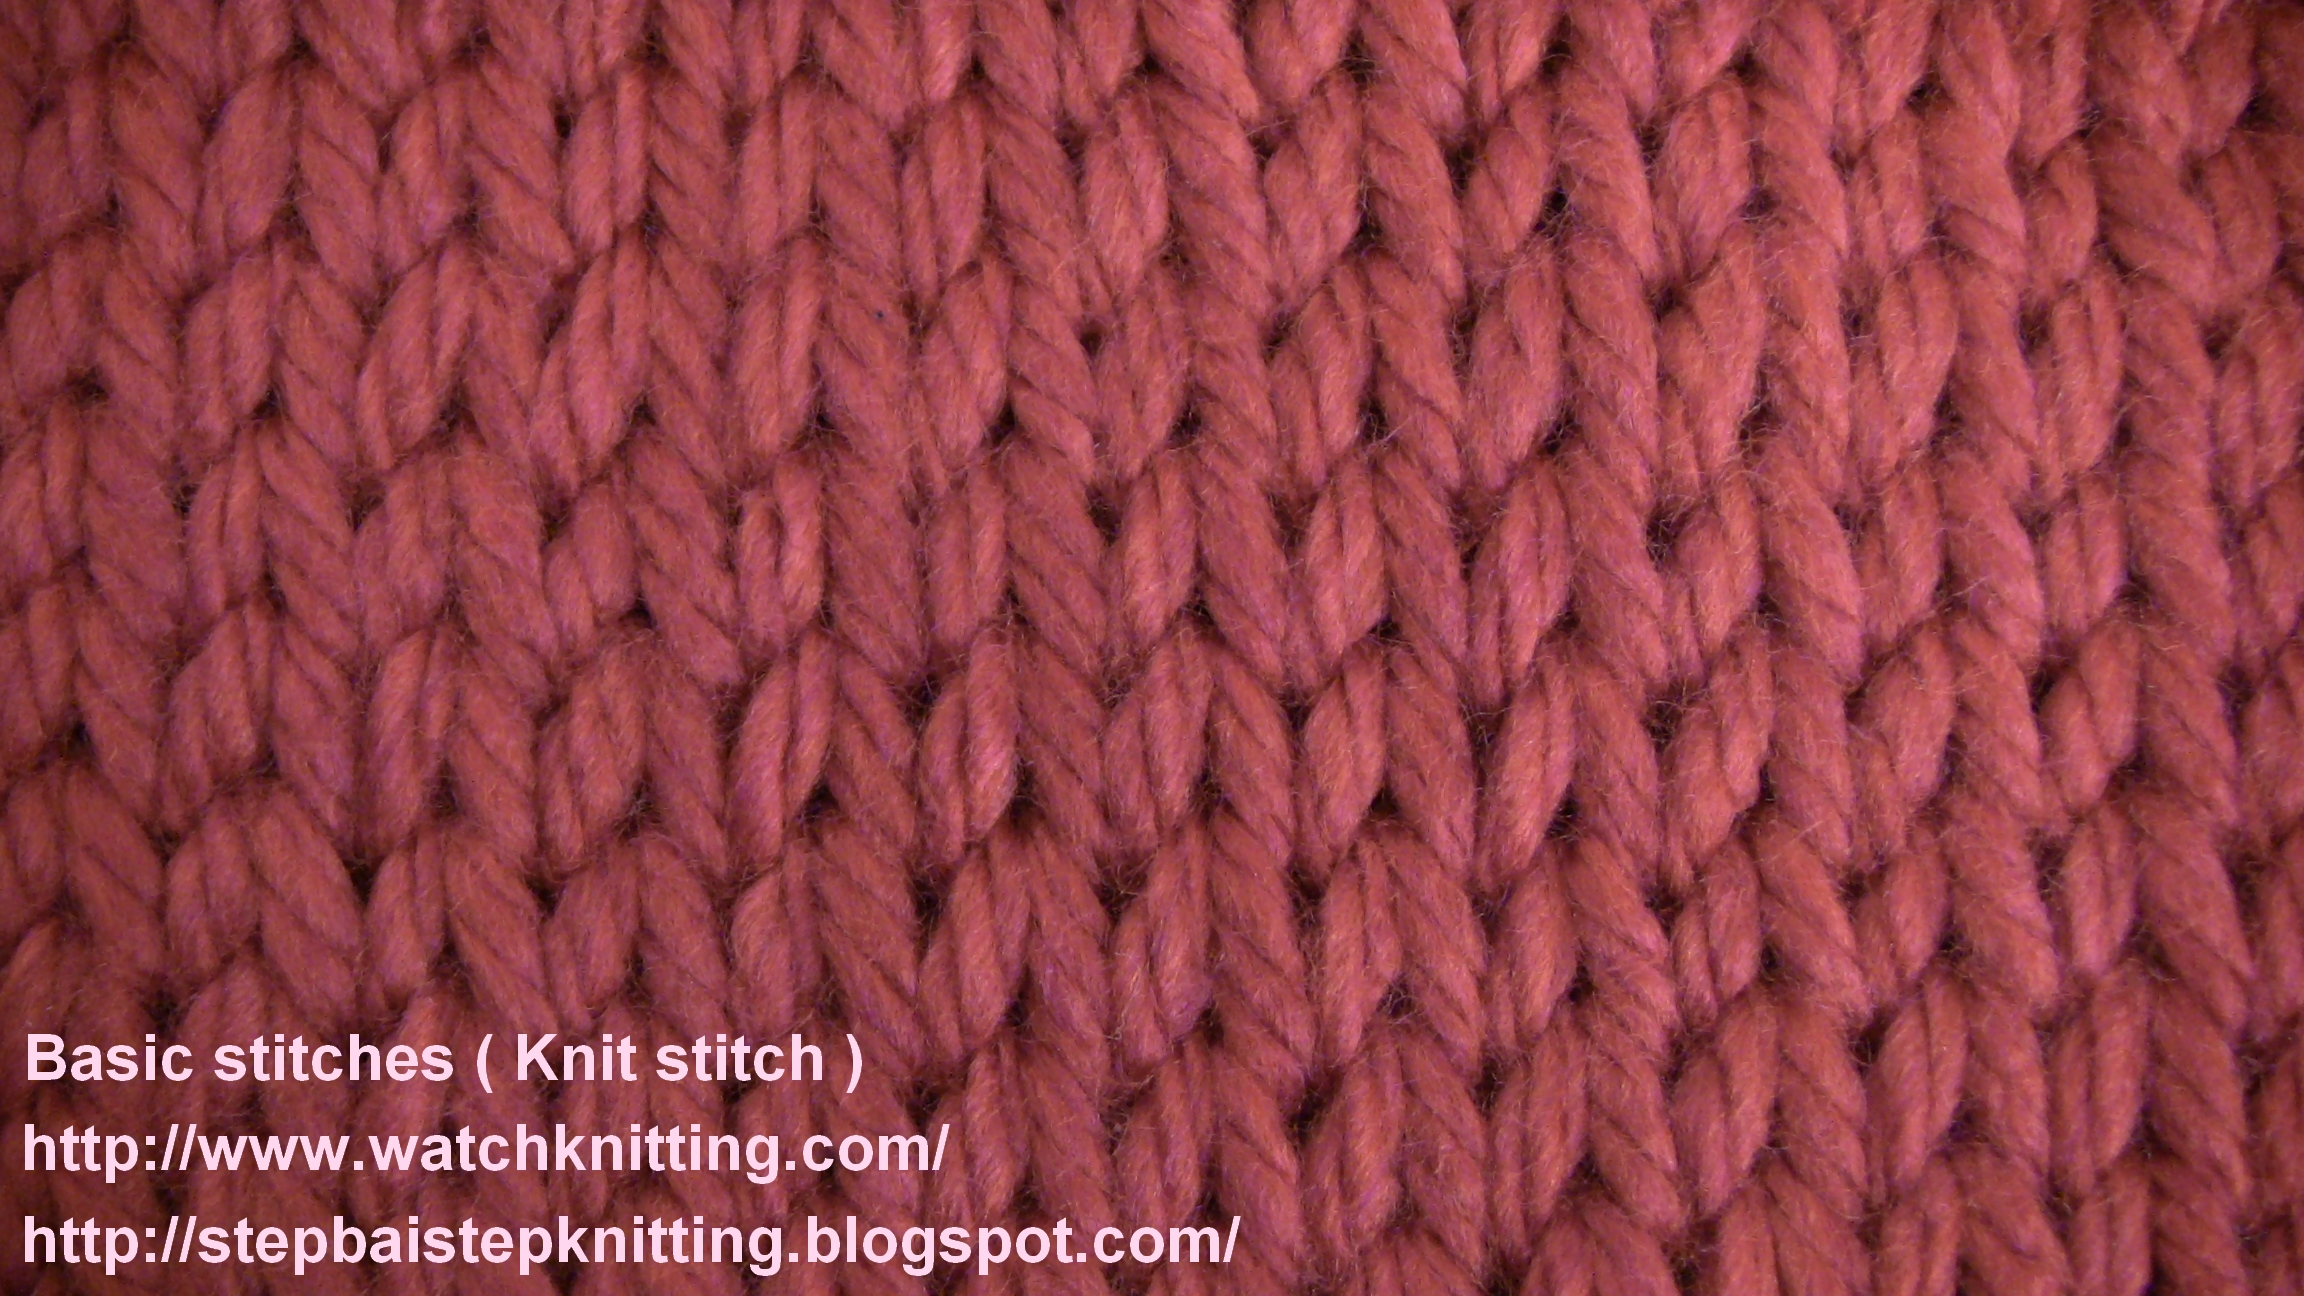 Basic Knitting Tutorial Pdf : Tutorial knit stitch